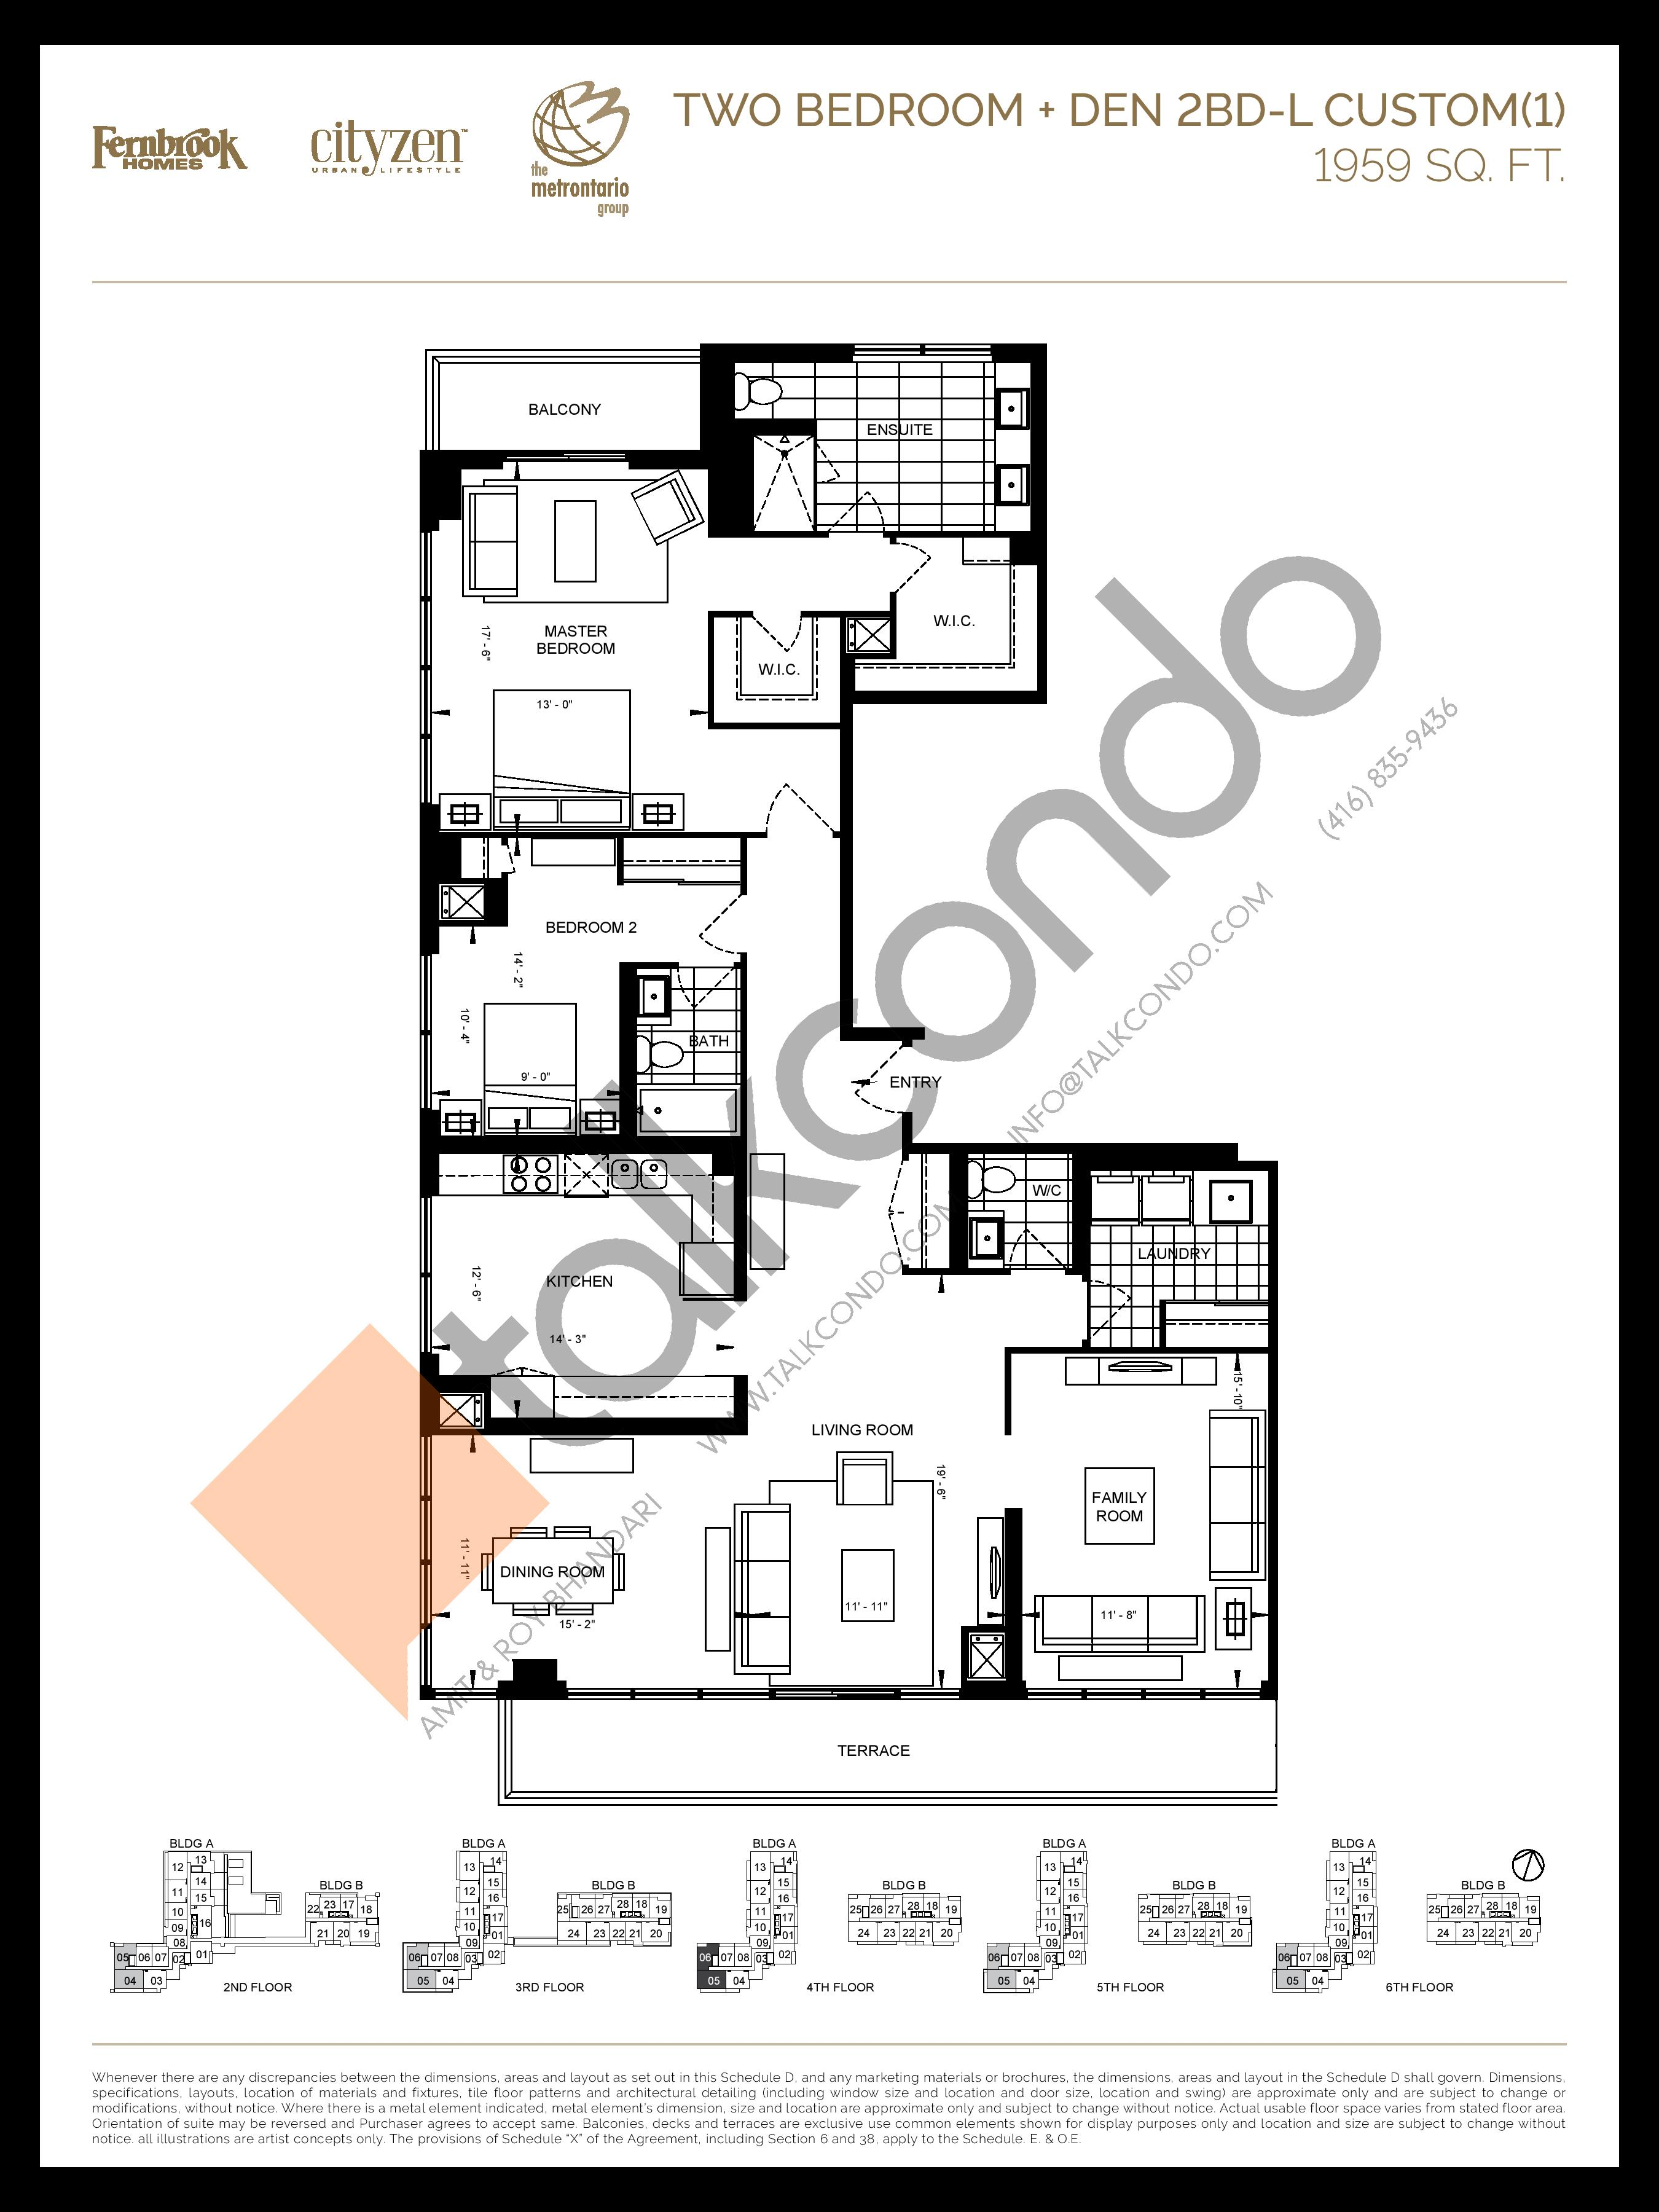 2BD-L CUSTOM(1) Floor Plan at D'or Condos - 1959 sq.ft